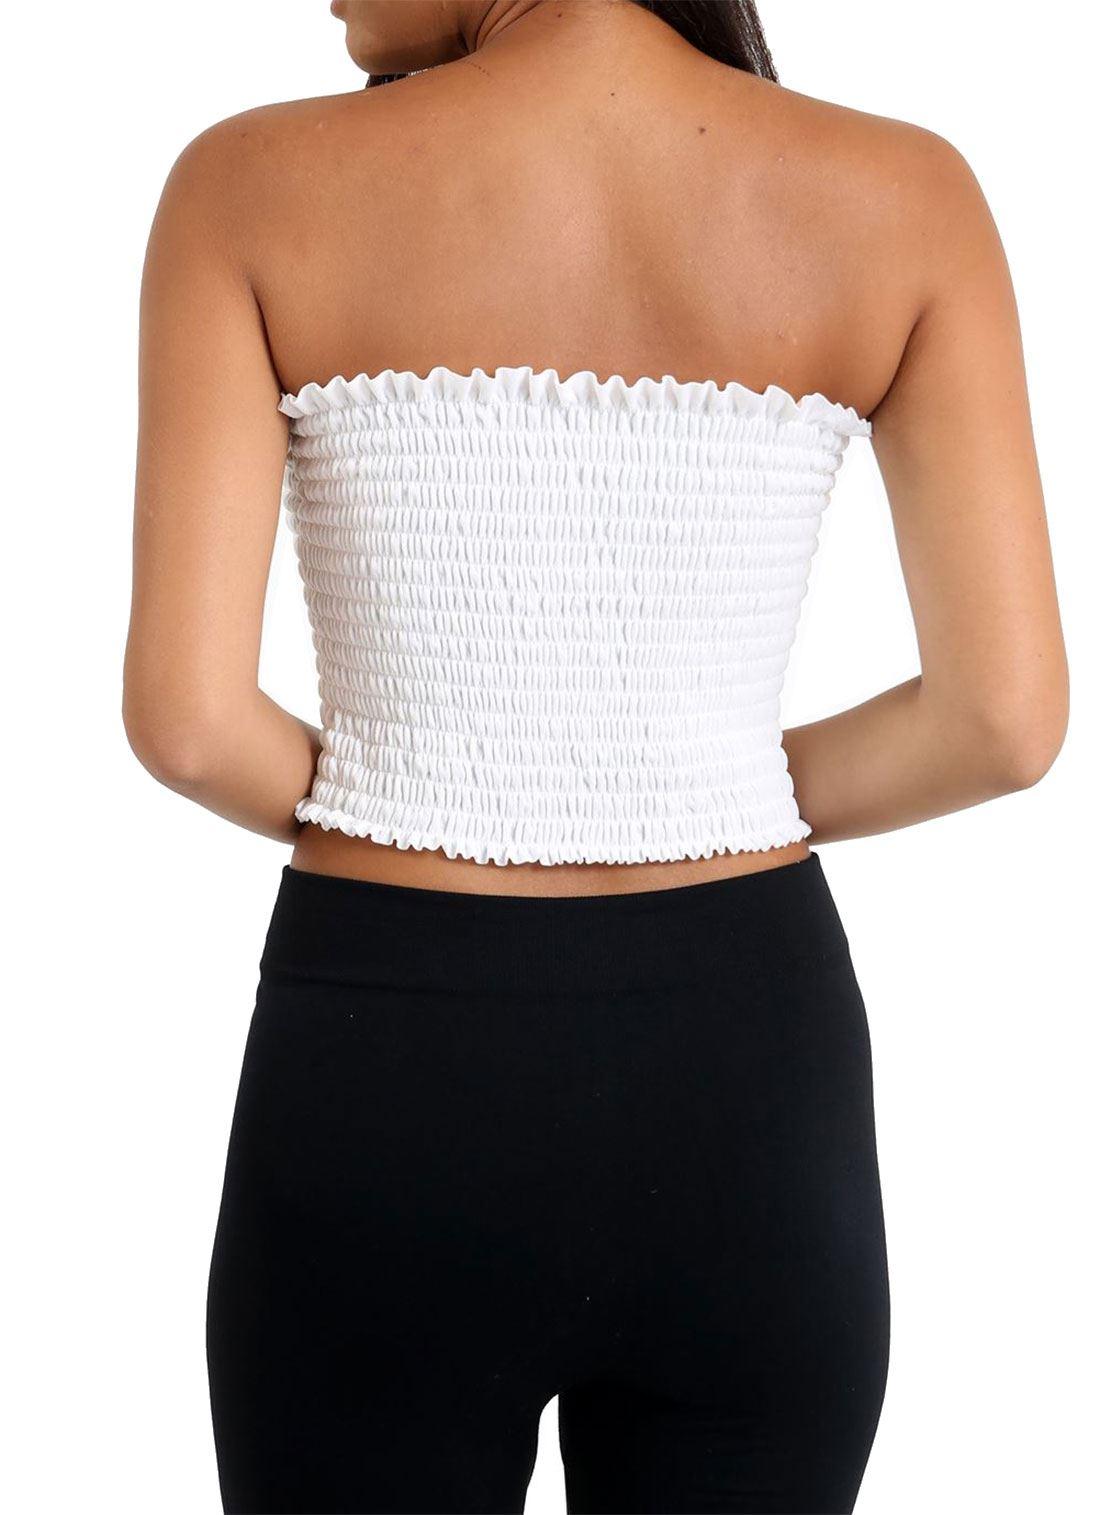 Womens Straplesss Bandeau Sheering Crop Top Ladies Gather Boobtube Shirred Top